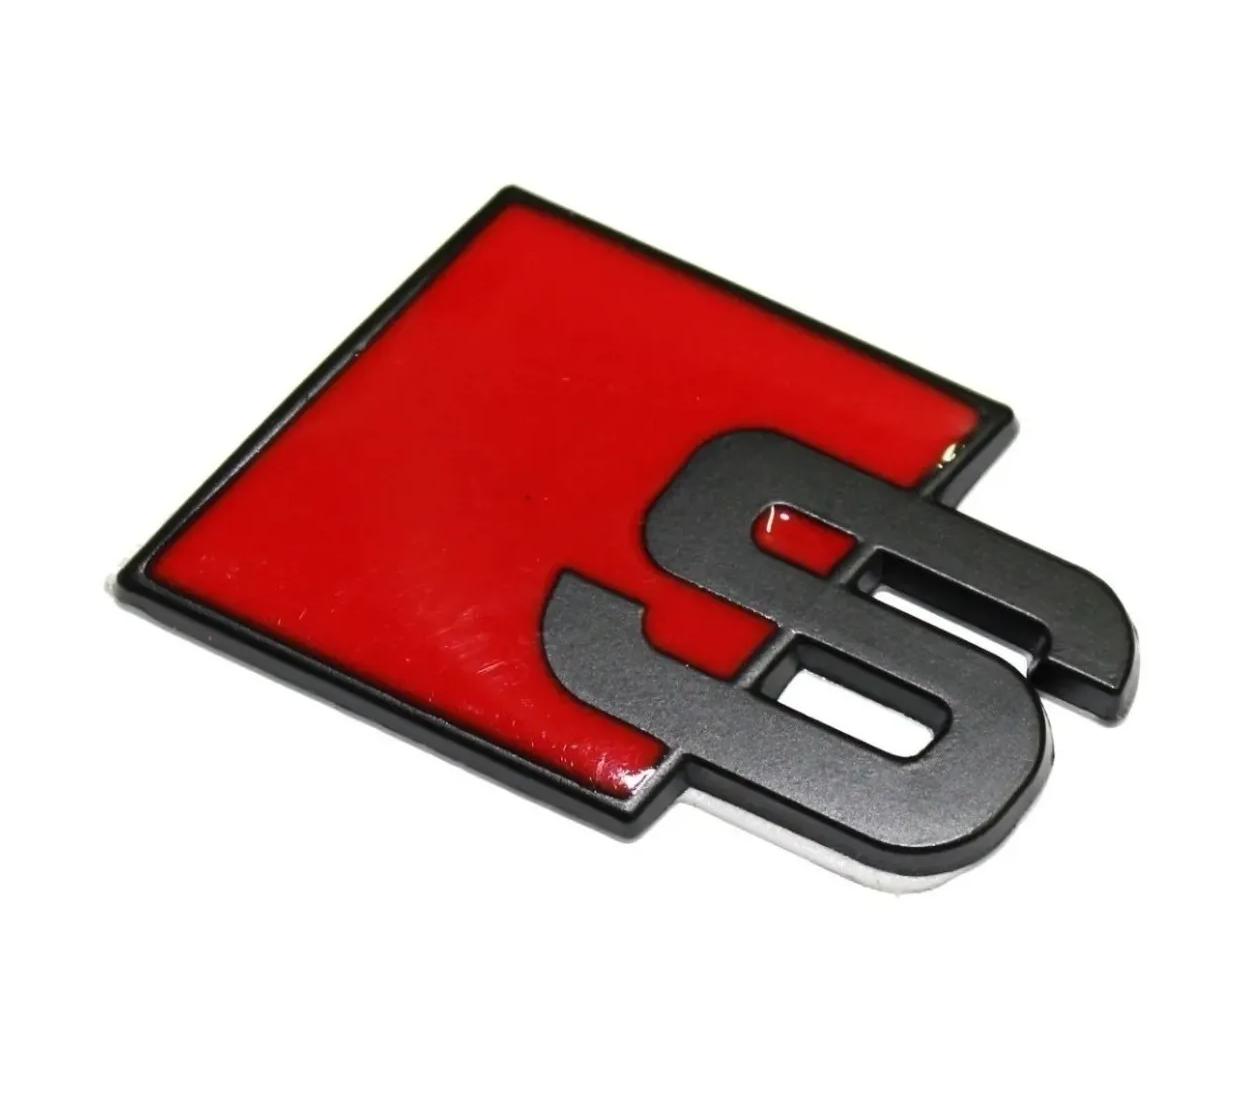 Acessório Emblema Audi S Line Sline S3 A3 A6 Q3 Q7 Tt A8 A4